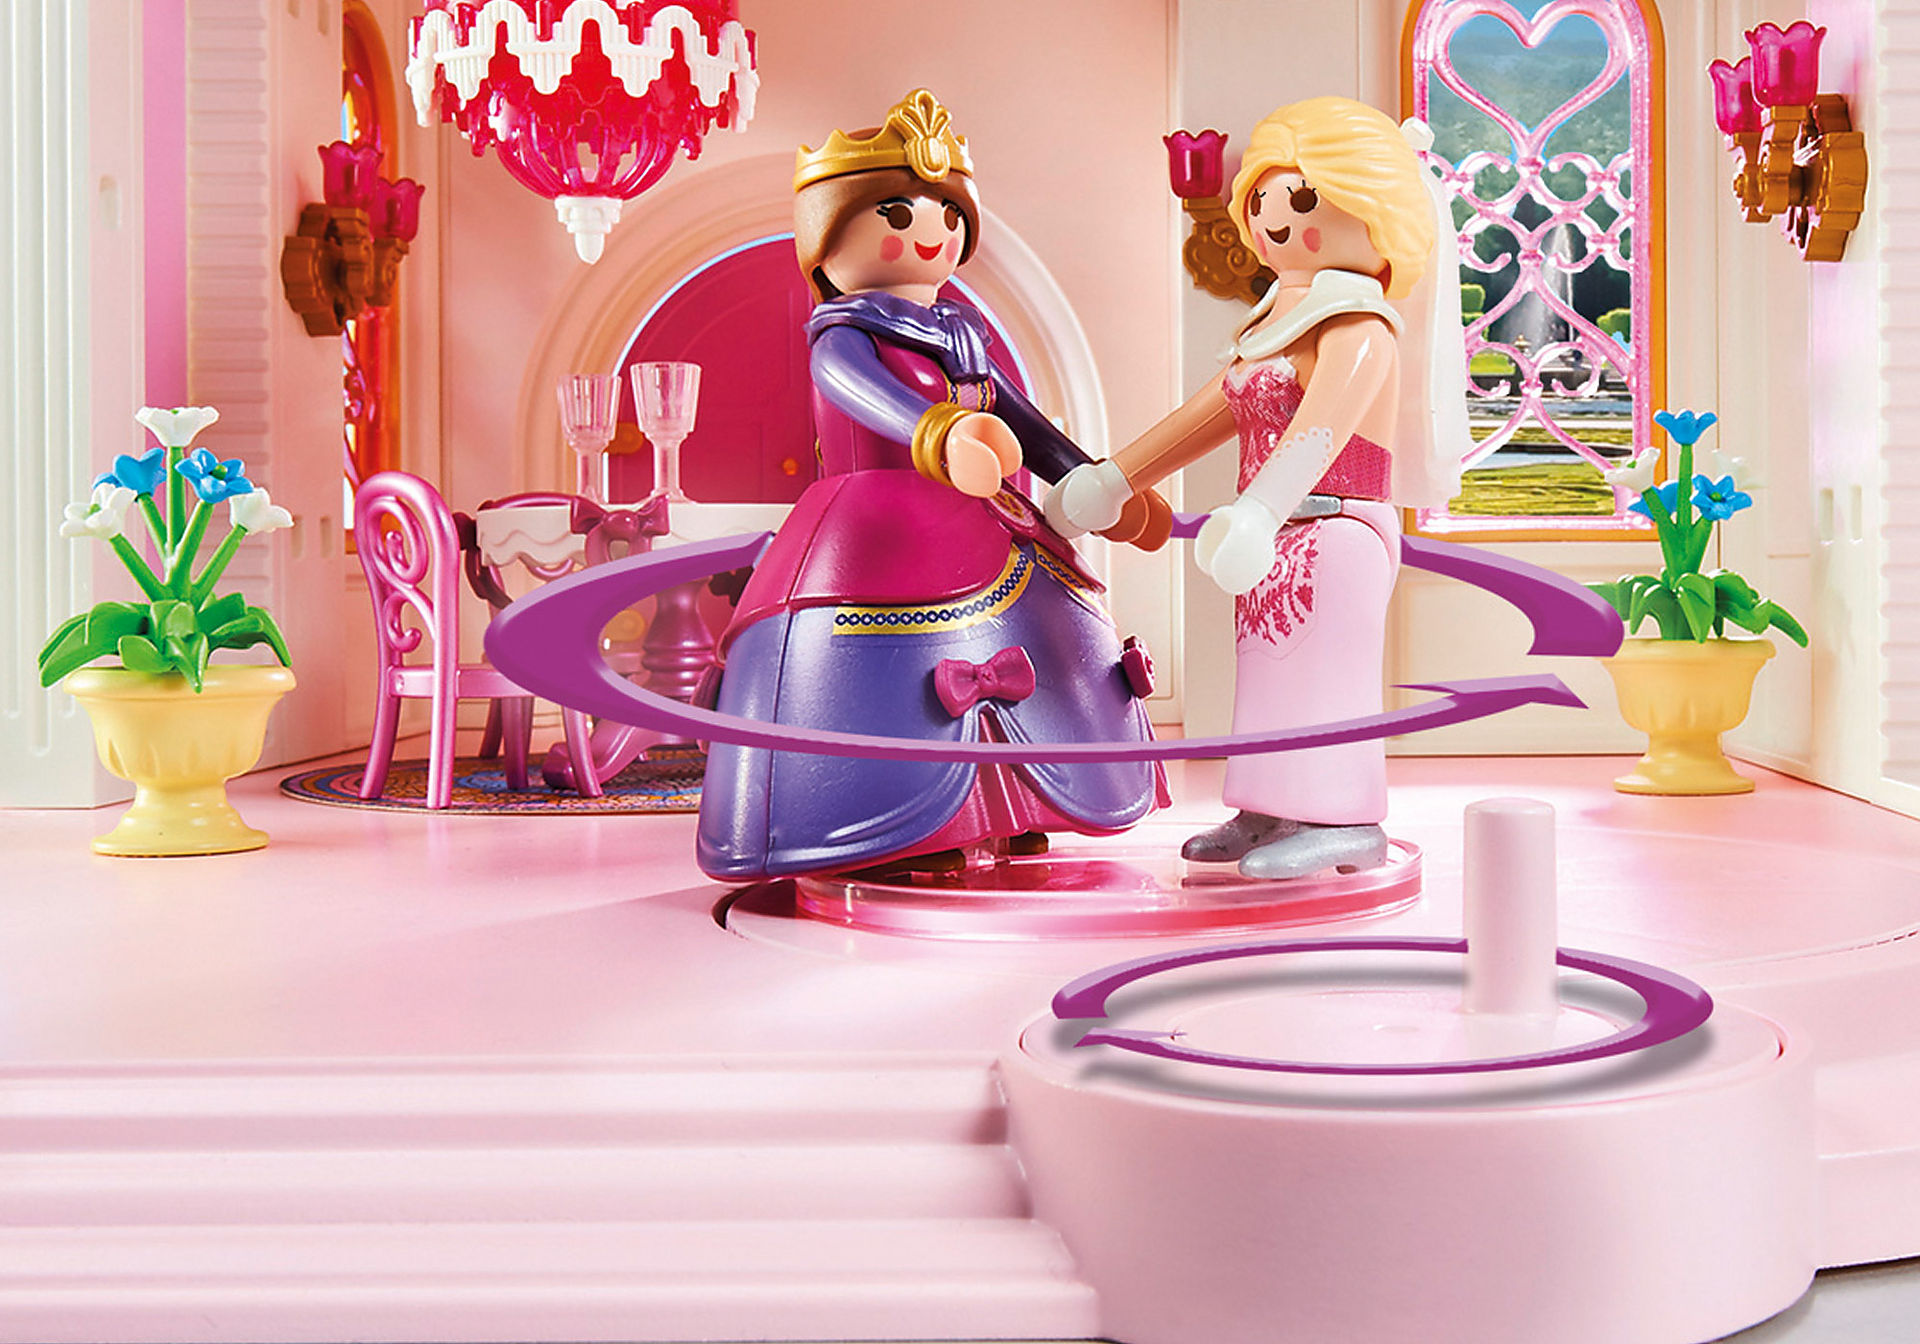 70447 Grande Castelo das Princesas zoom image8